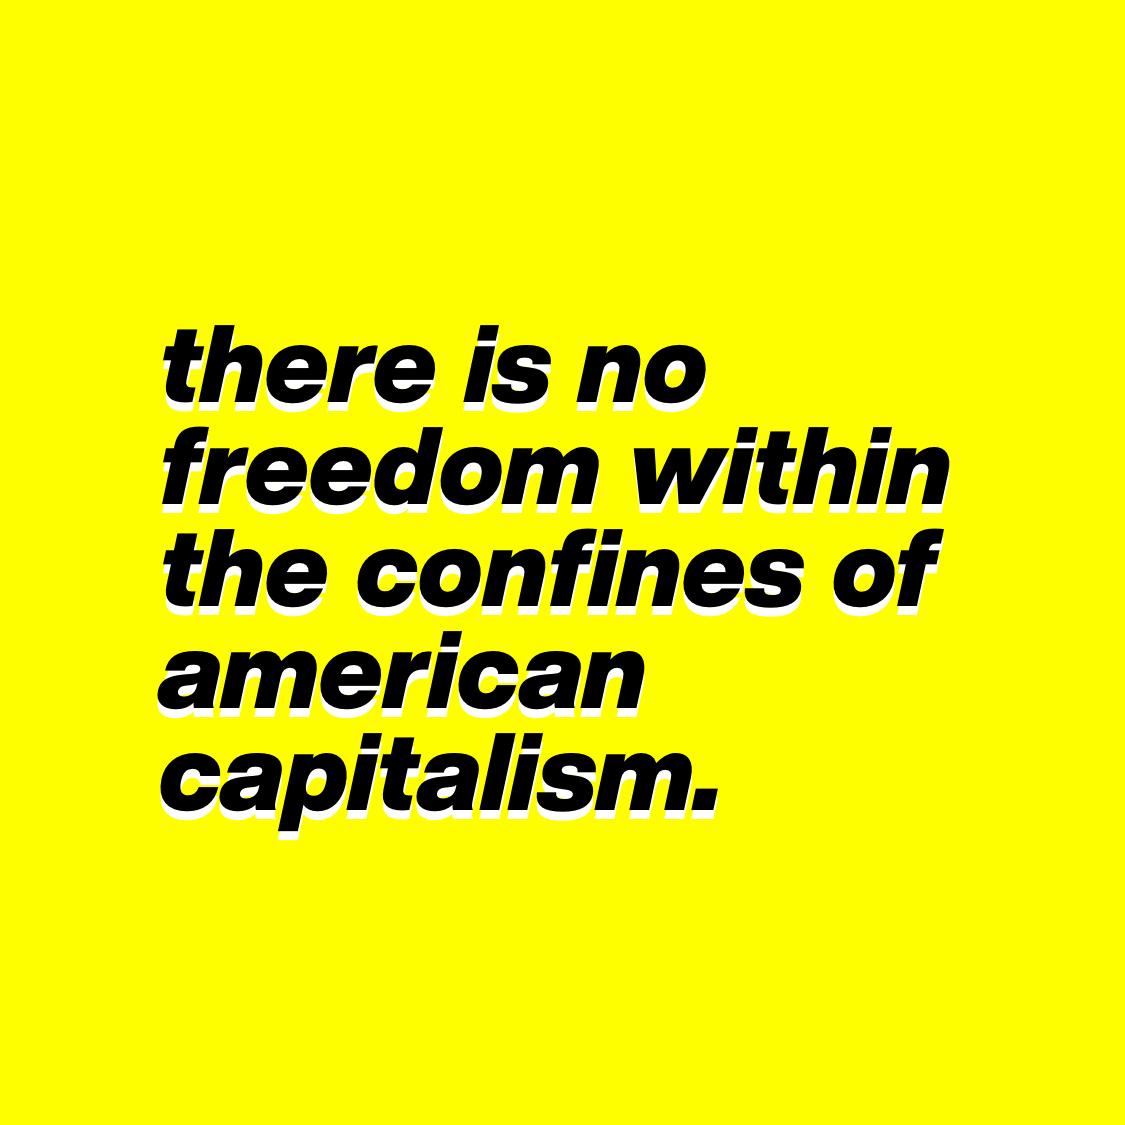 american capitalism 1